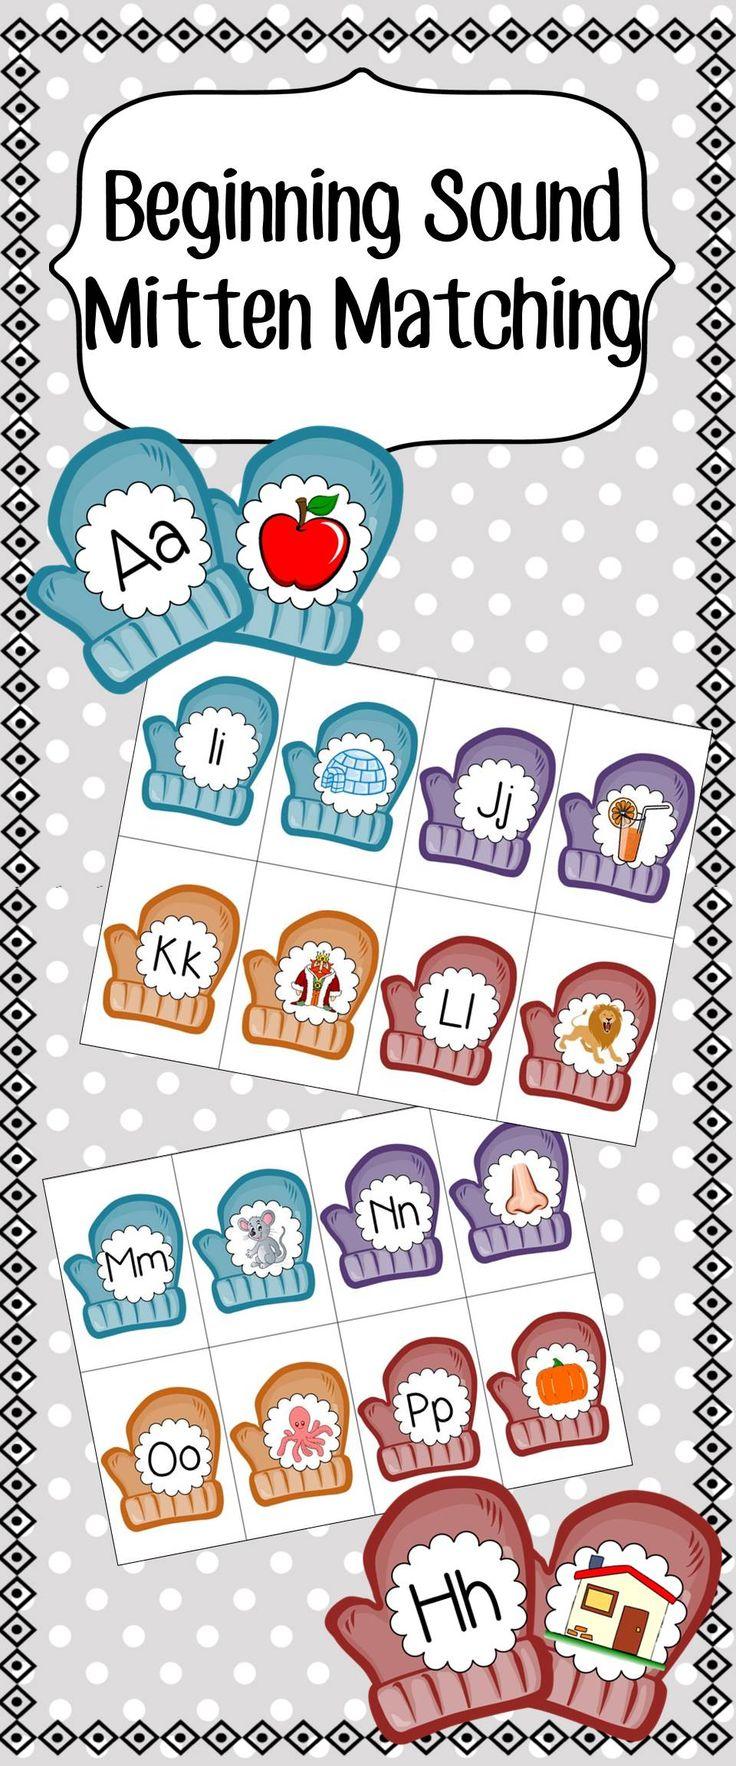 Beginning Sound Mitten Matching Game - Pre-K, Kindergarten, First Grade Literature Center Activity. Match Letter Mittens to Their Corresponding Cartoon Picture. Fun Winter or Christmas Activity